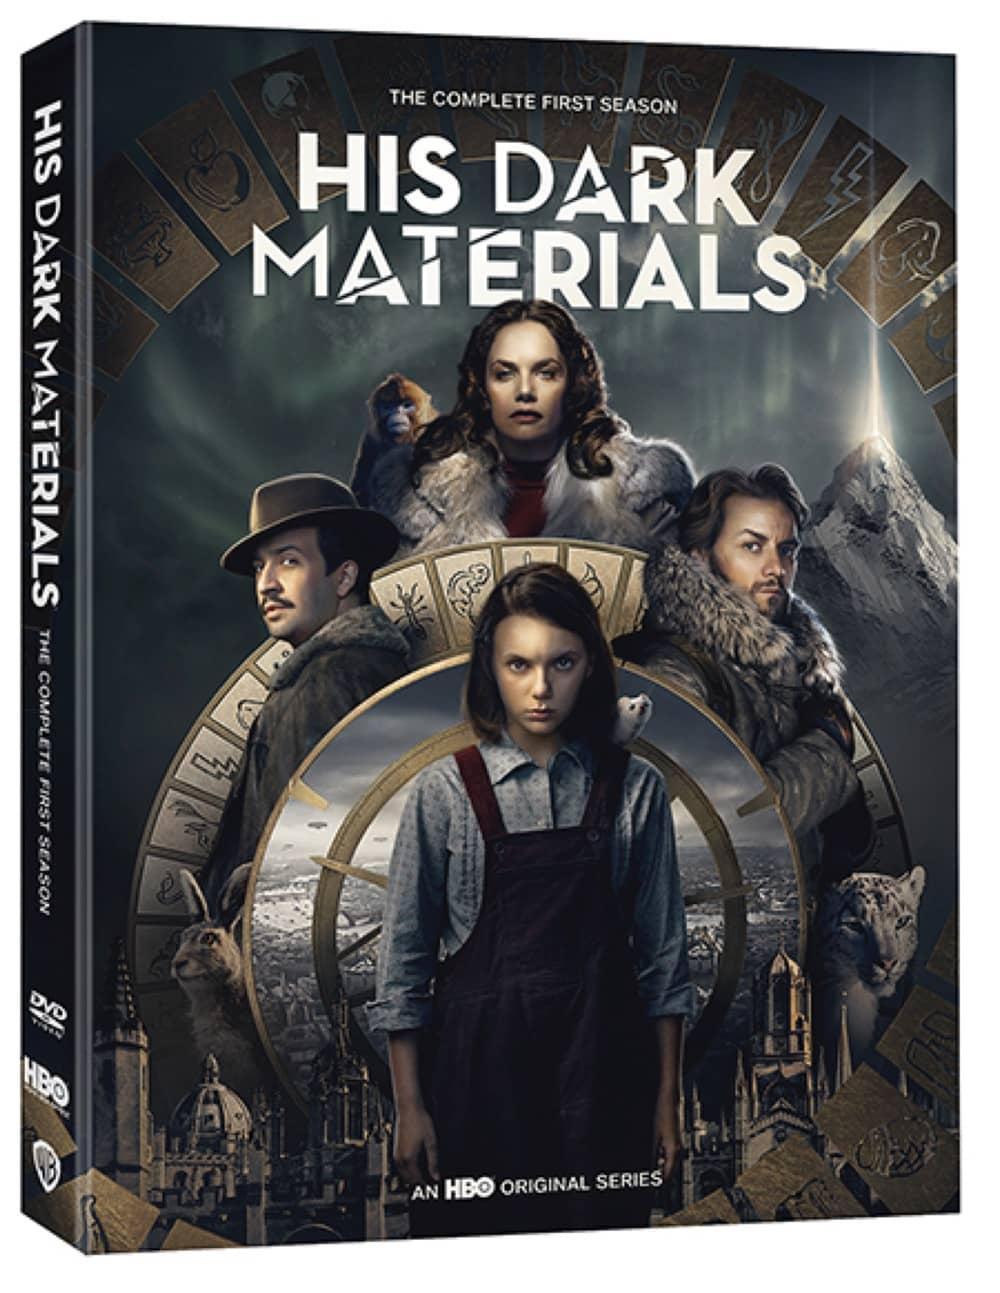 His Dark Materials S1 DVD